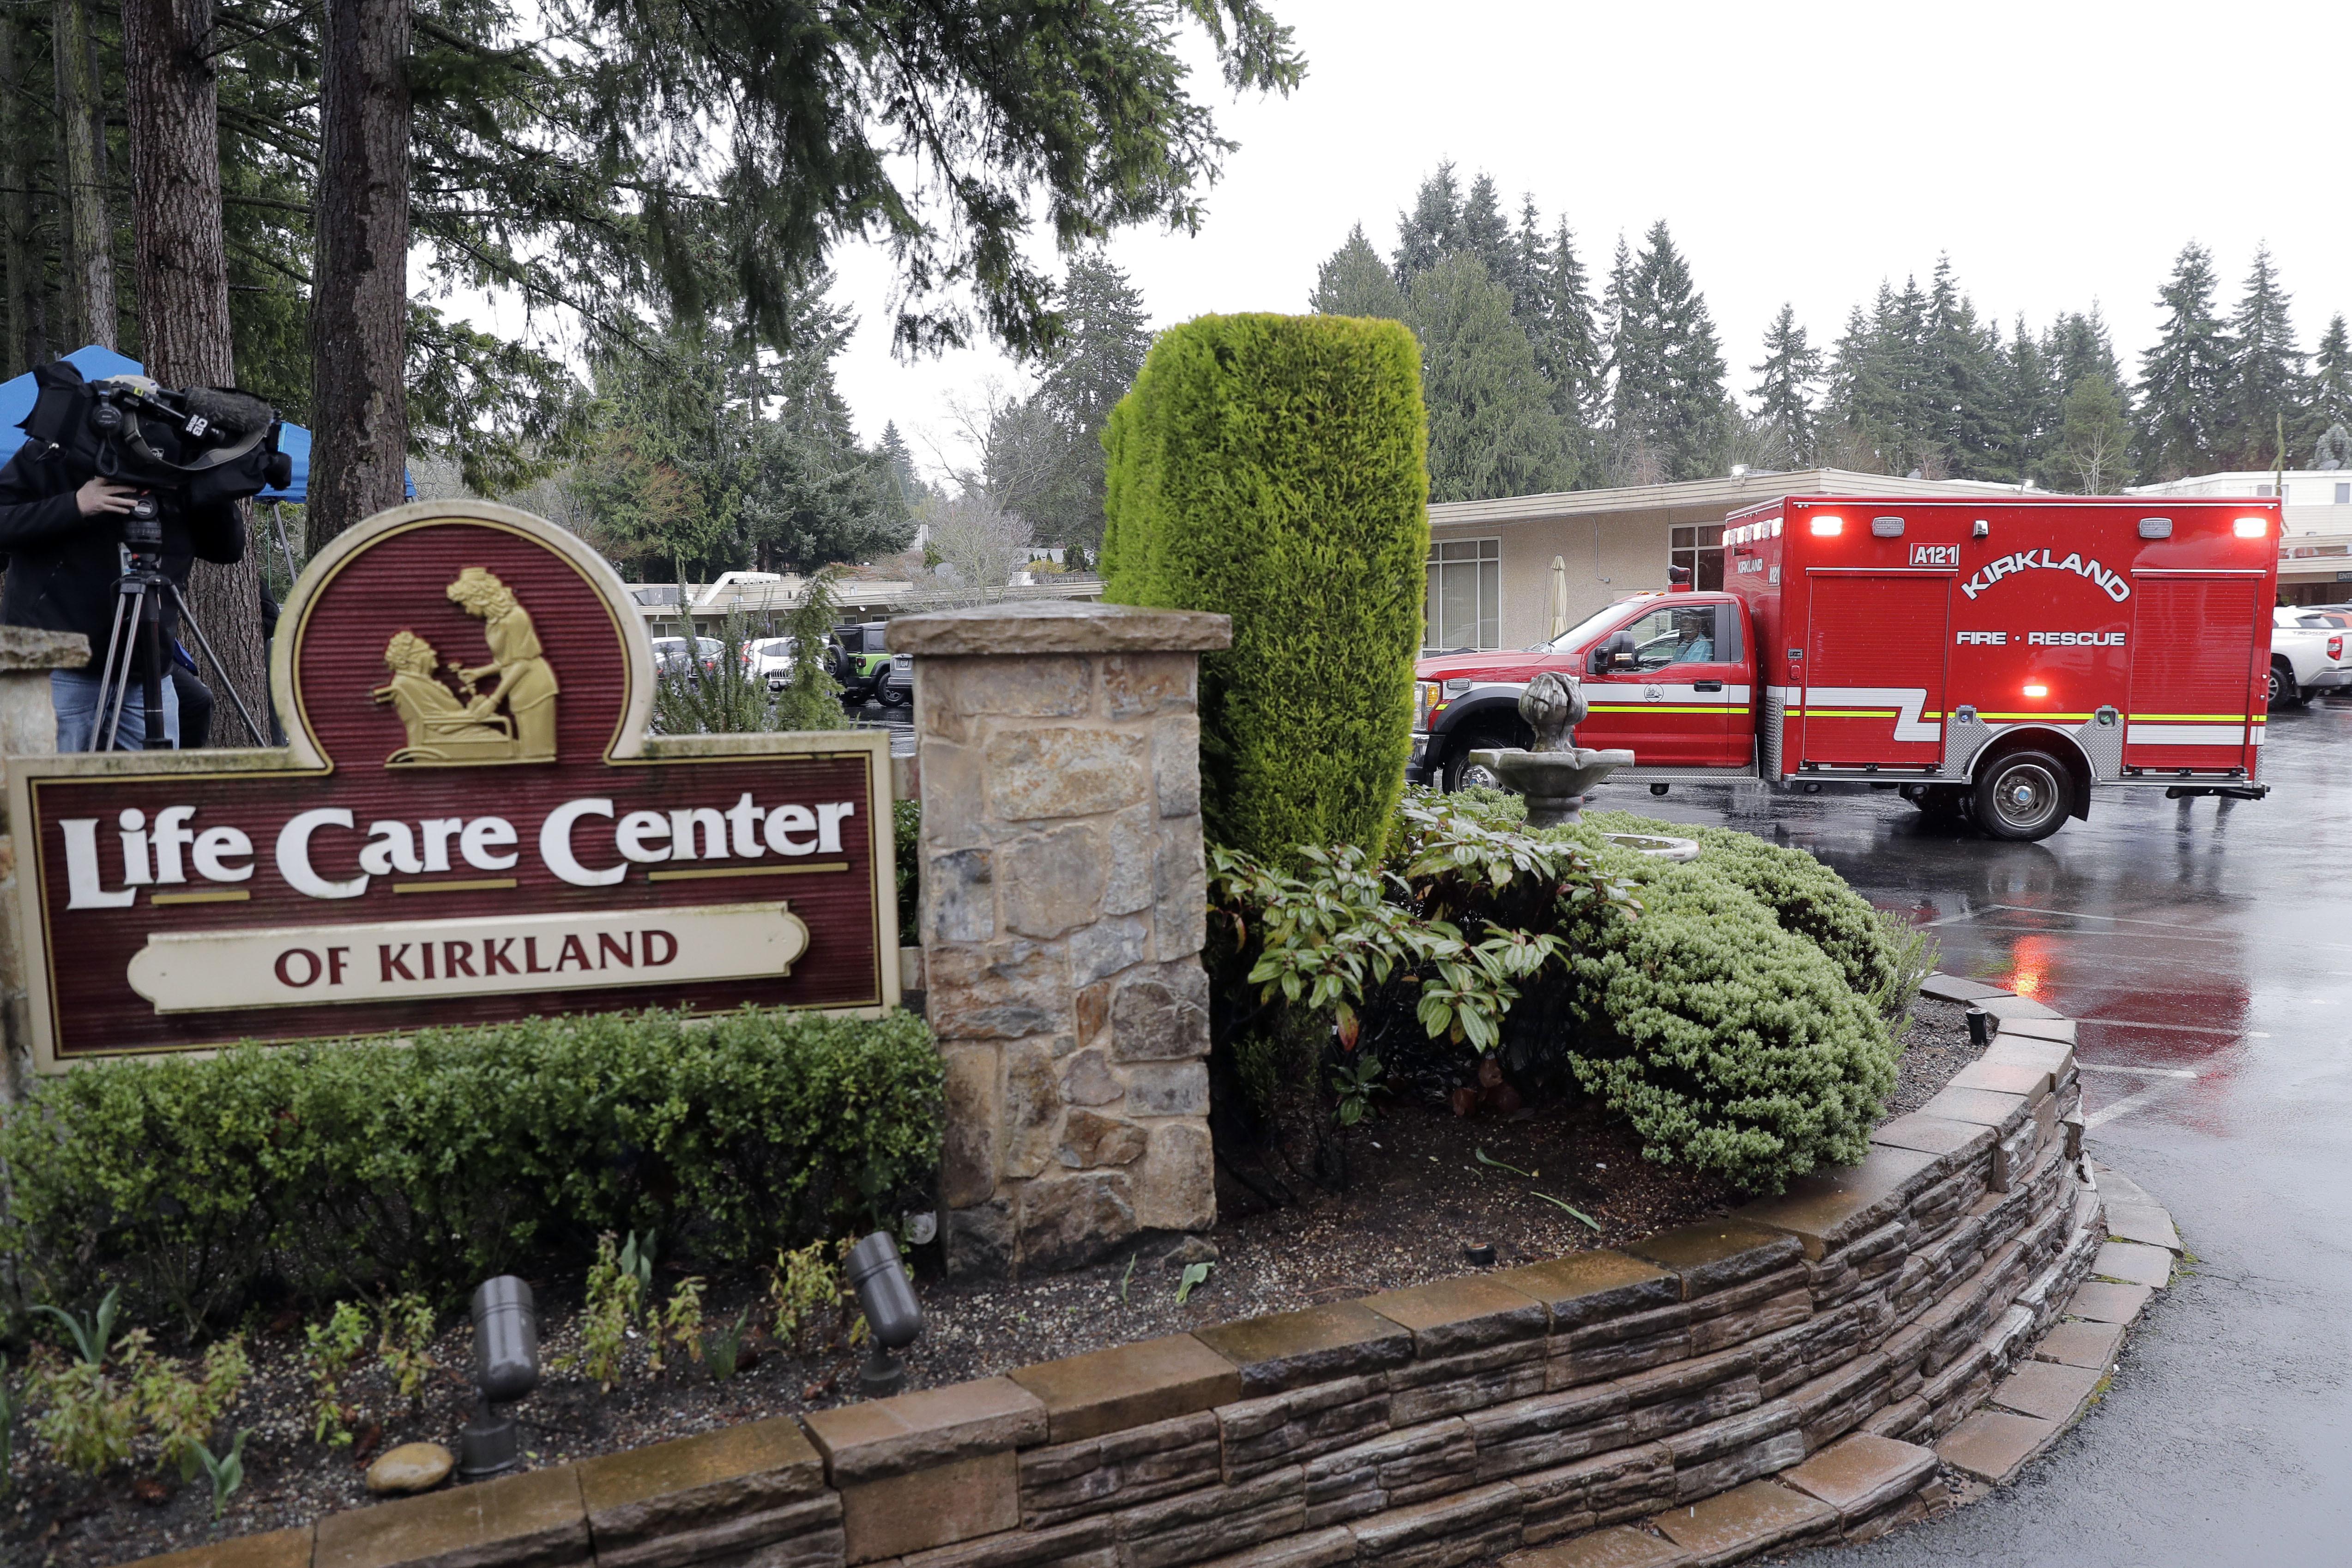 Coronavirus spreads in Washington, but local officials ... on Life Care Center Of Kirkland id=36716